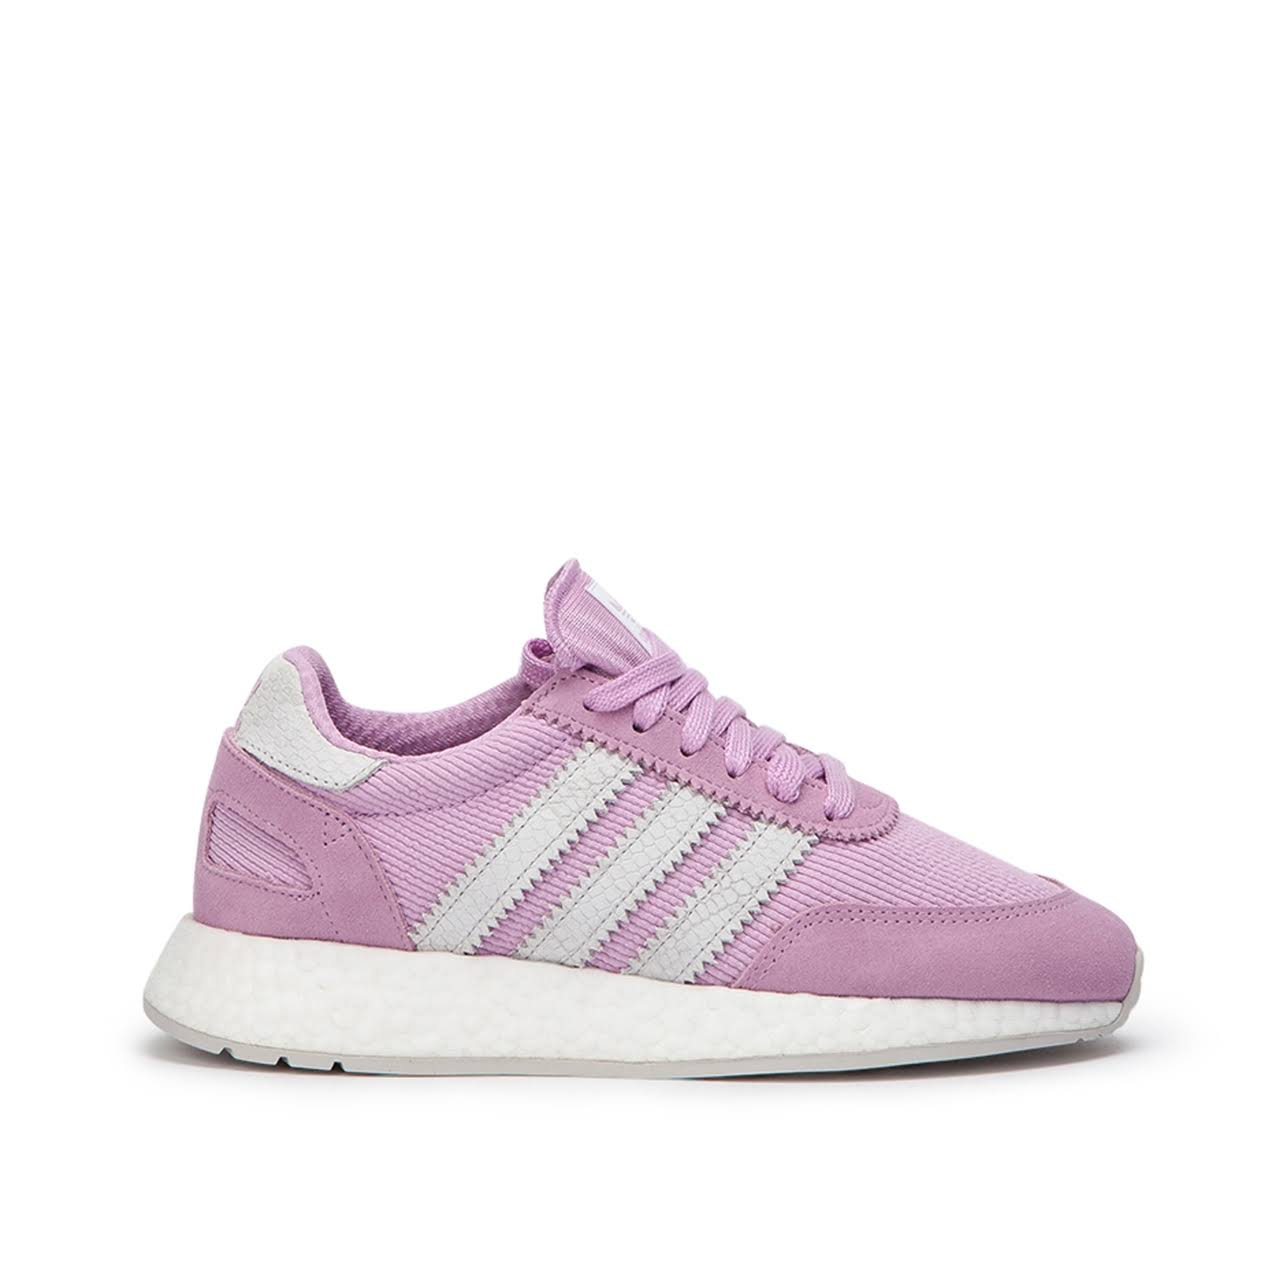 Crystal Grey crywht Lilac Adidas 5923 W greone Clelil One clear White I xwXTqZ